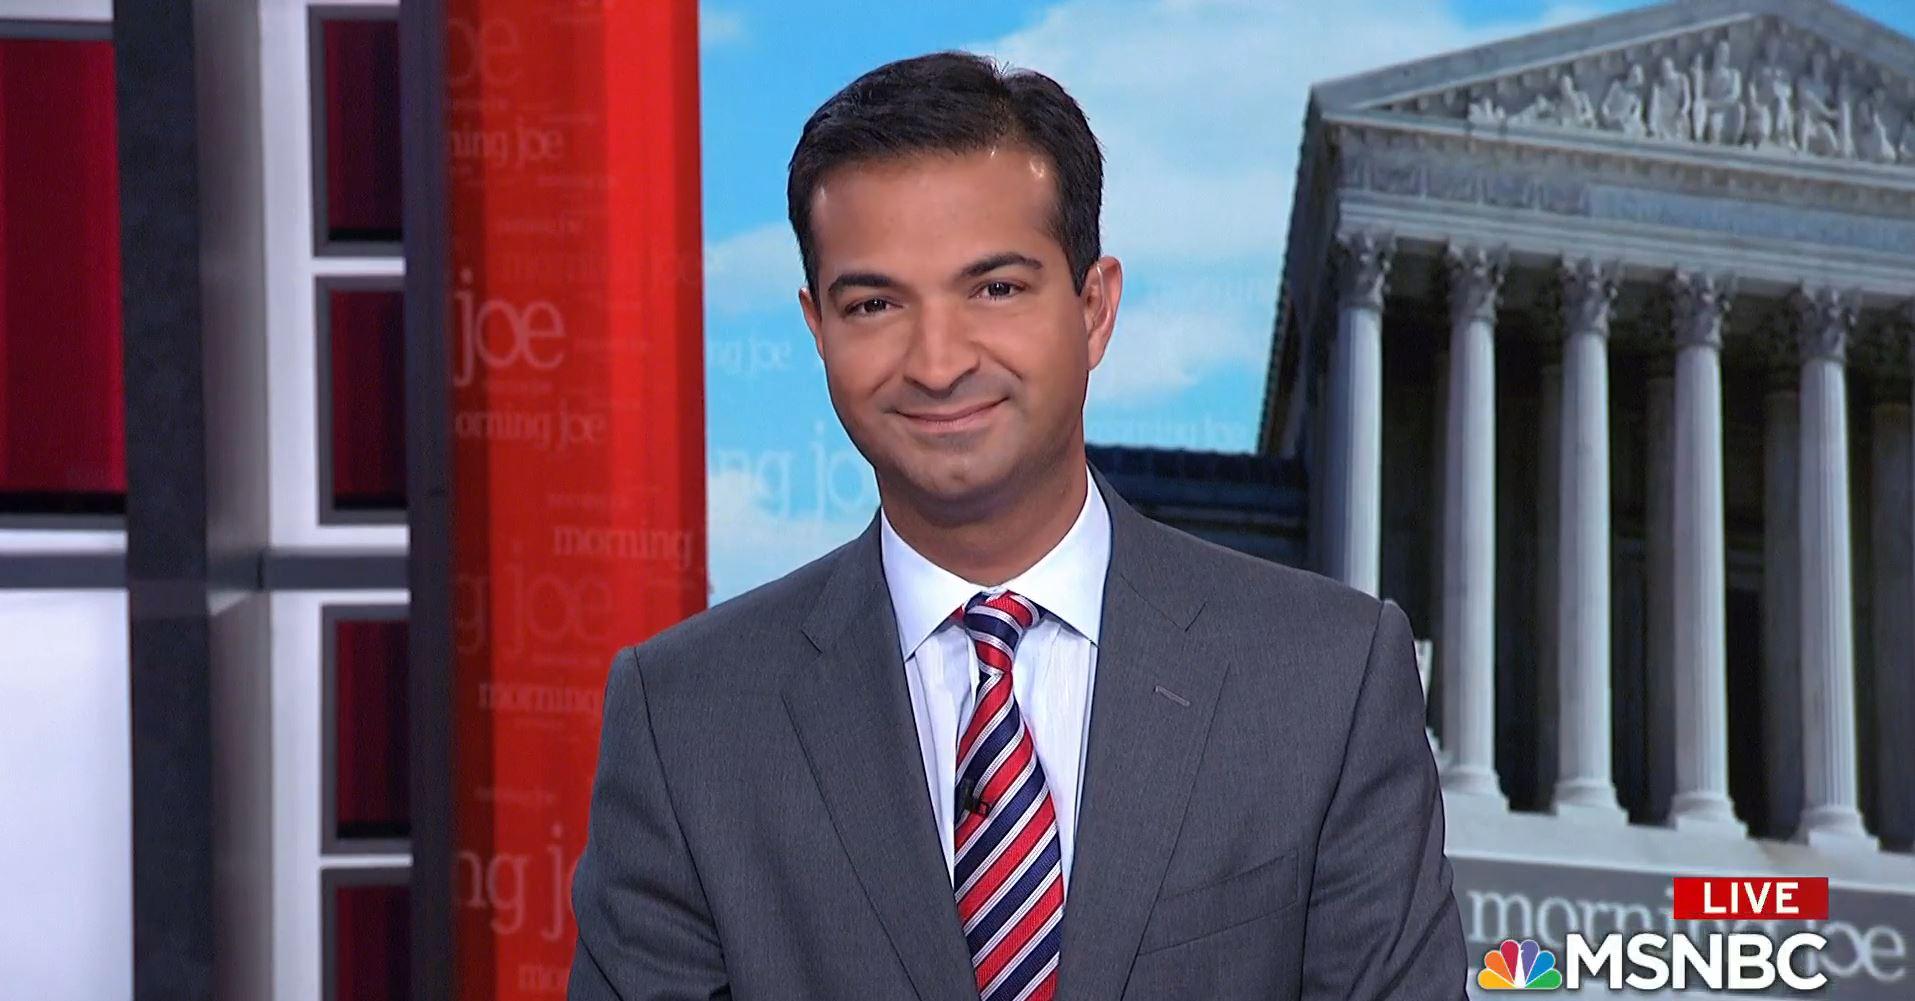 Carlos-Curbelo-MSNBC.jpg